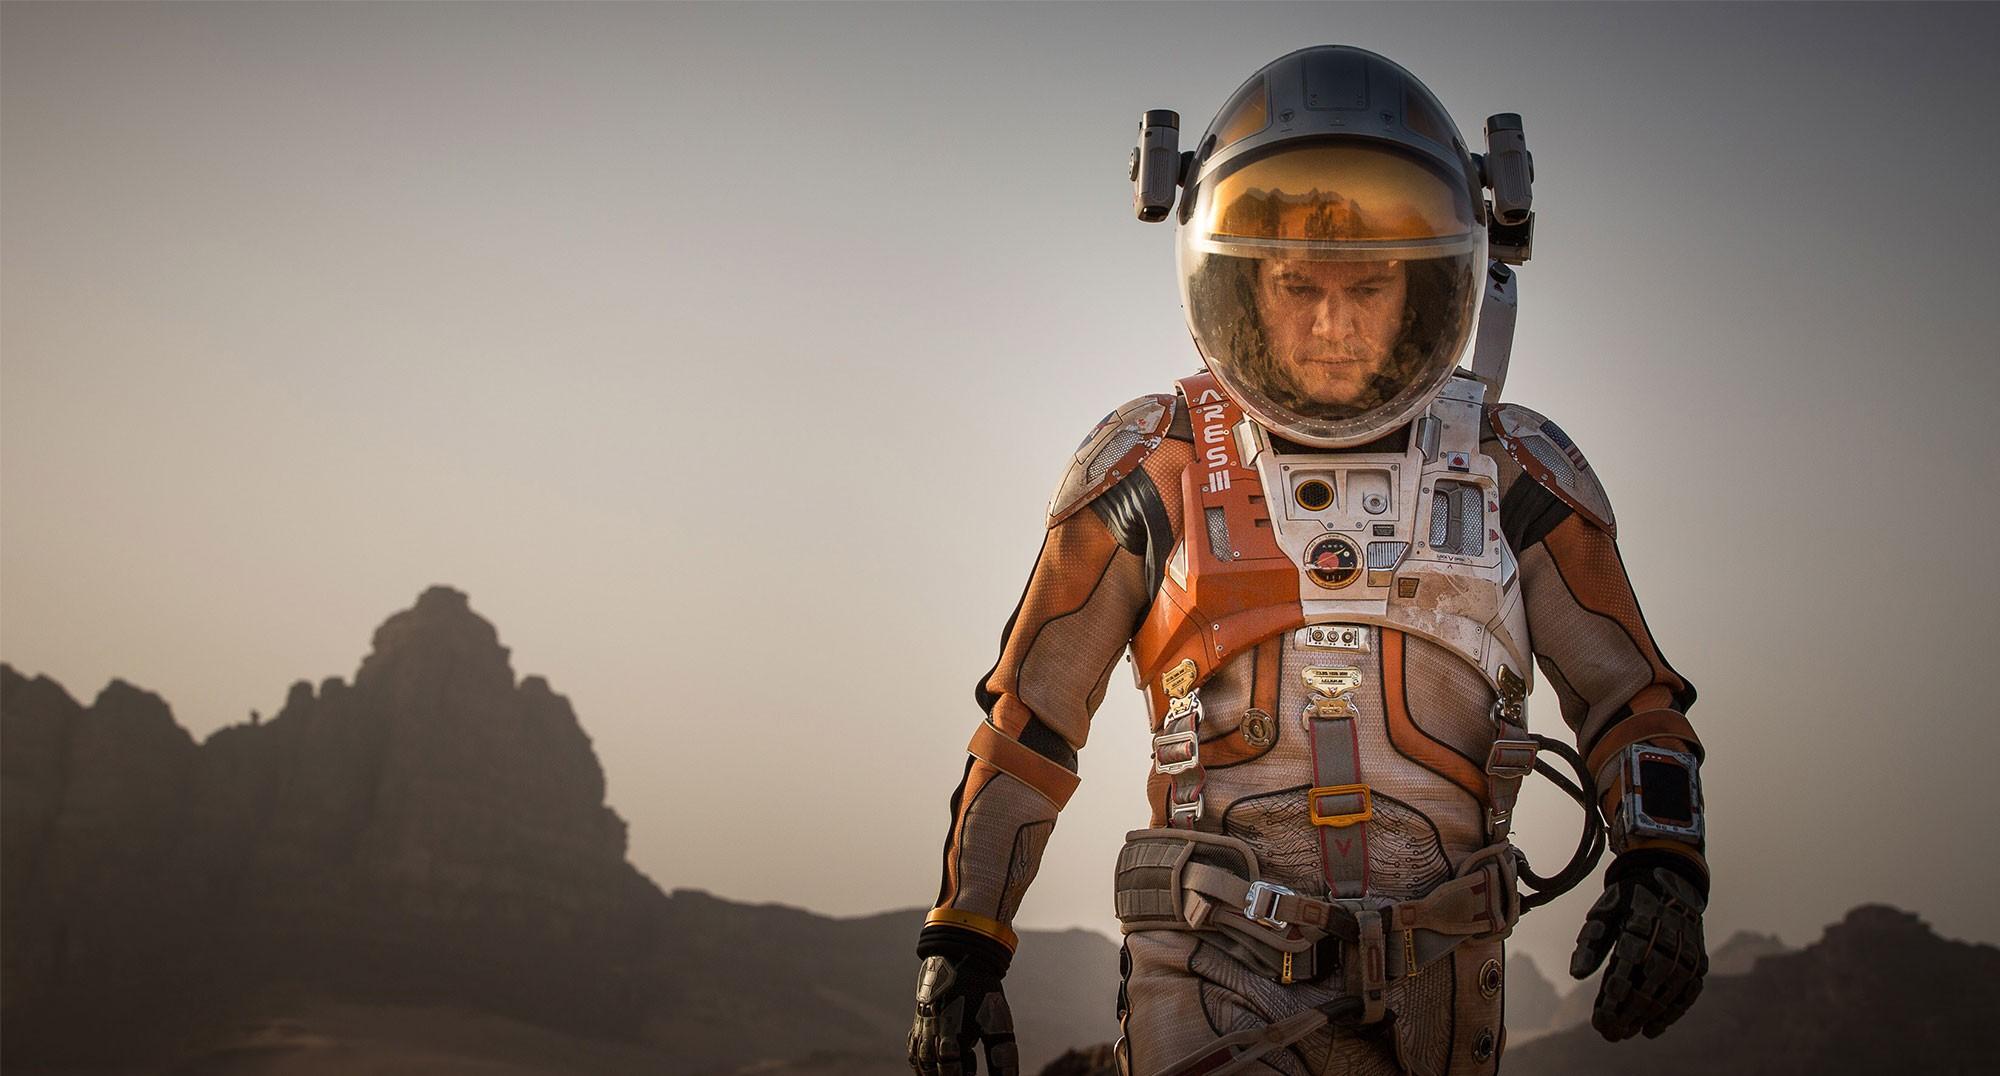 The Martian Honest Trailer